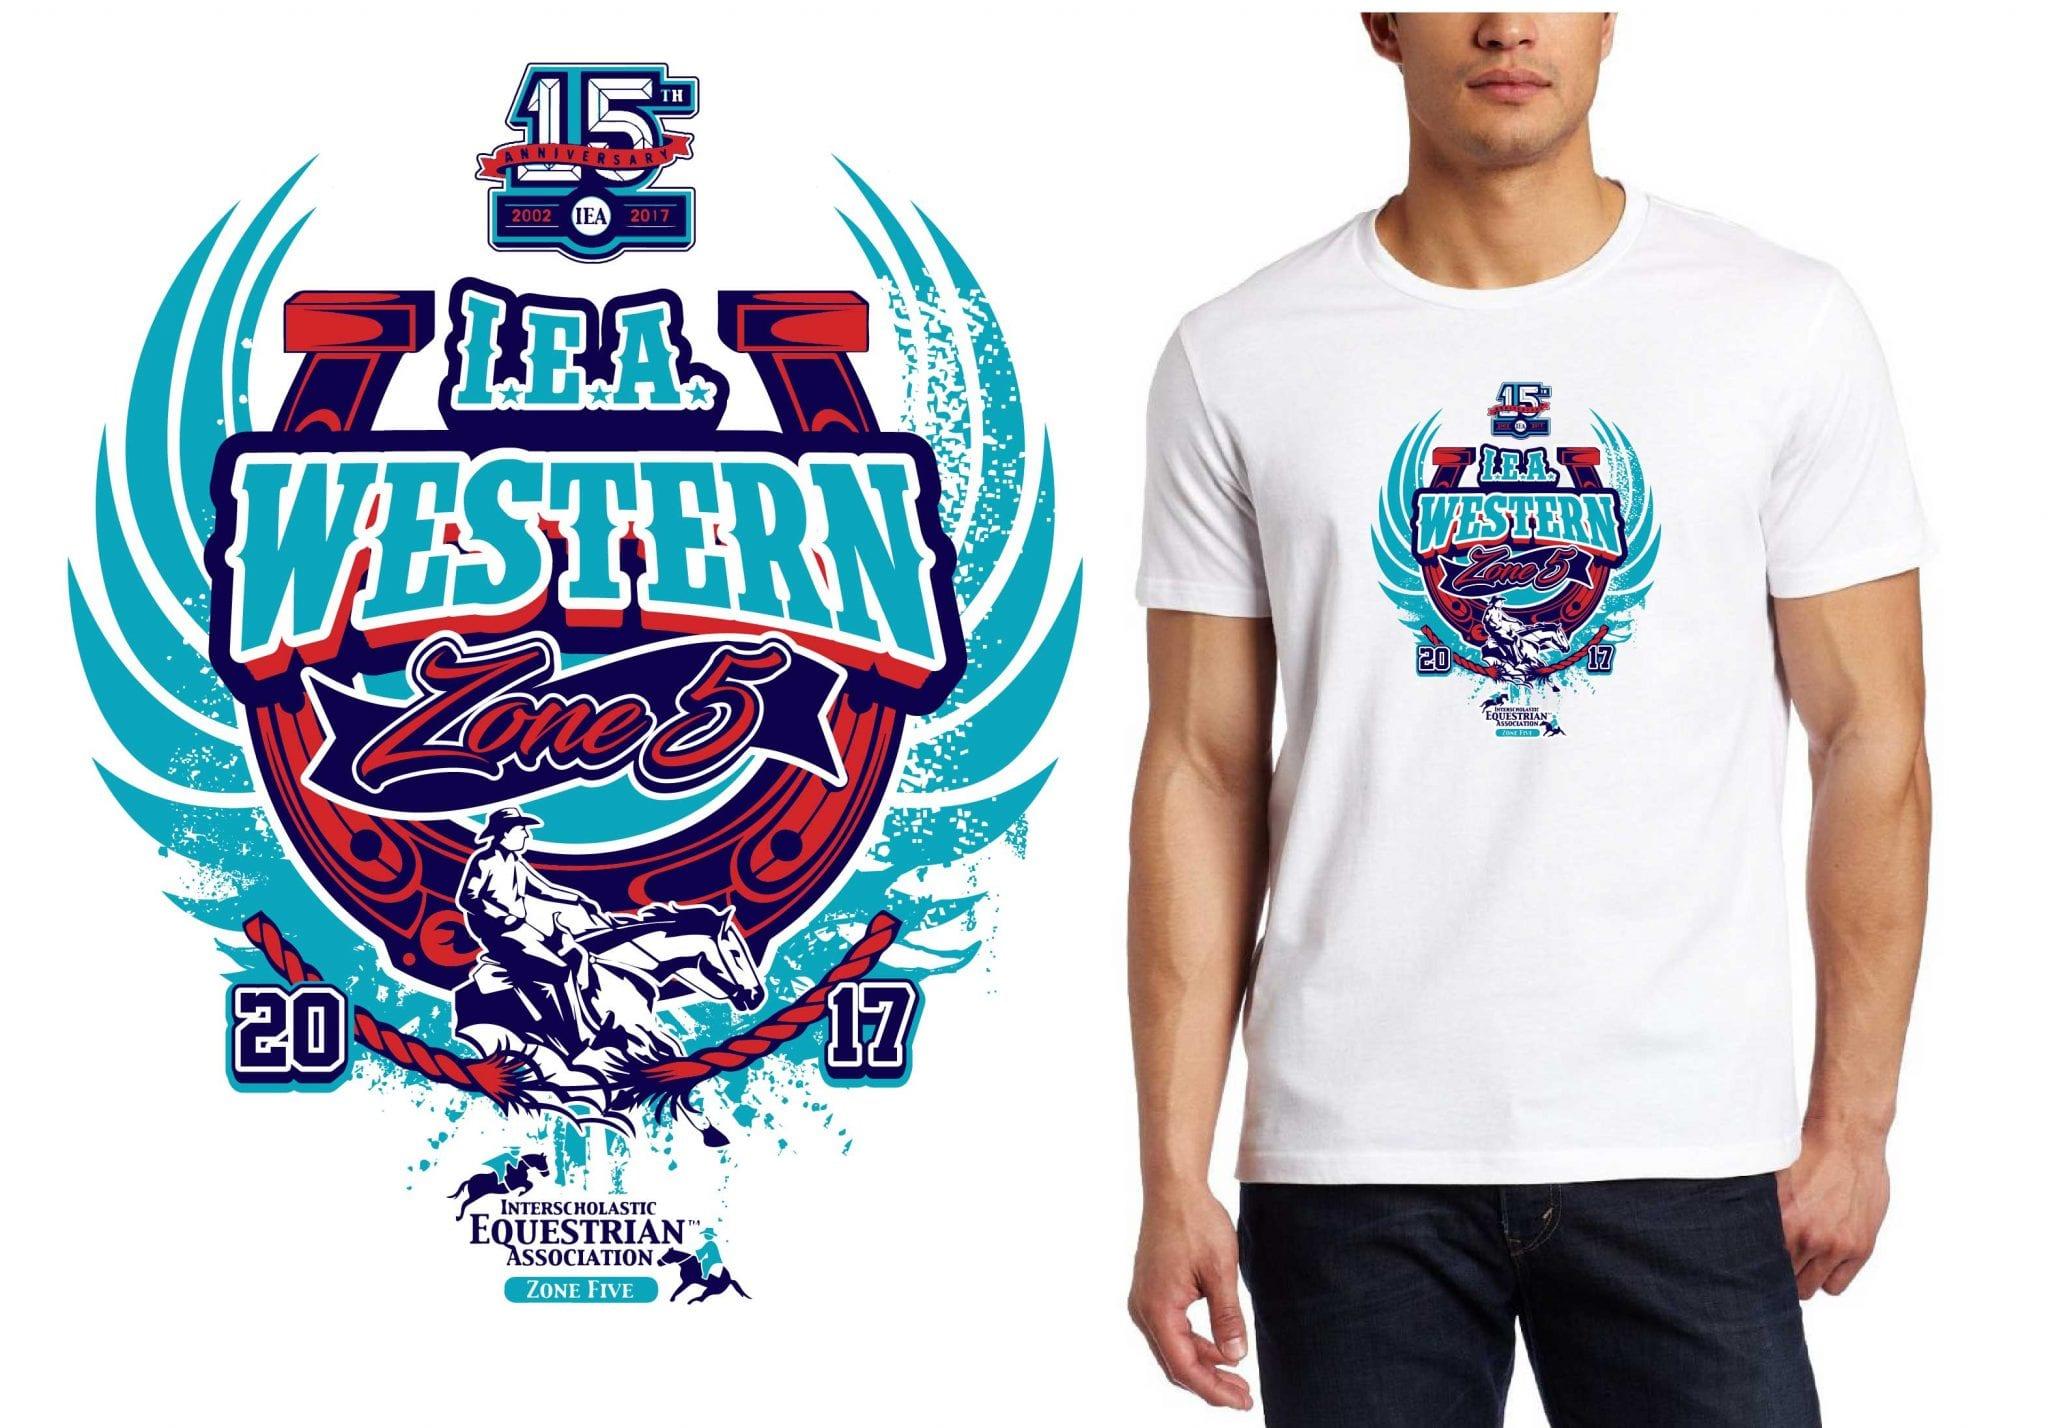 2017 Zone 5 Western Zone Finalsvector logo design for equstrian t-shirt UrArtStudio